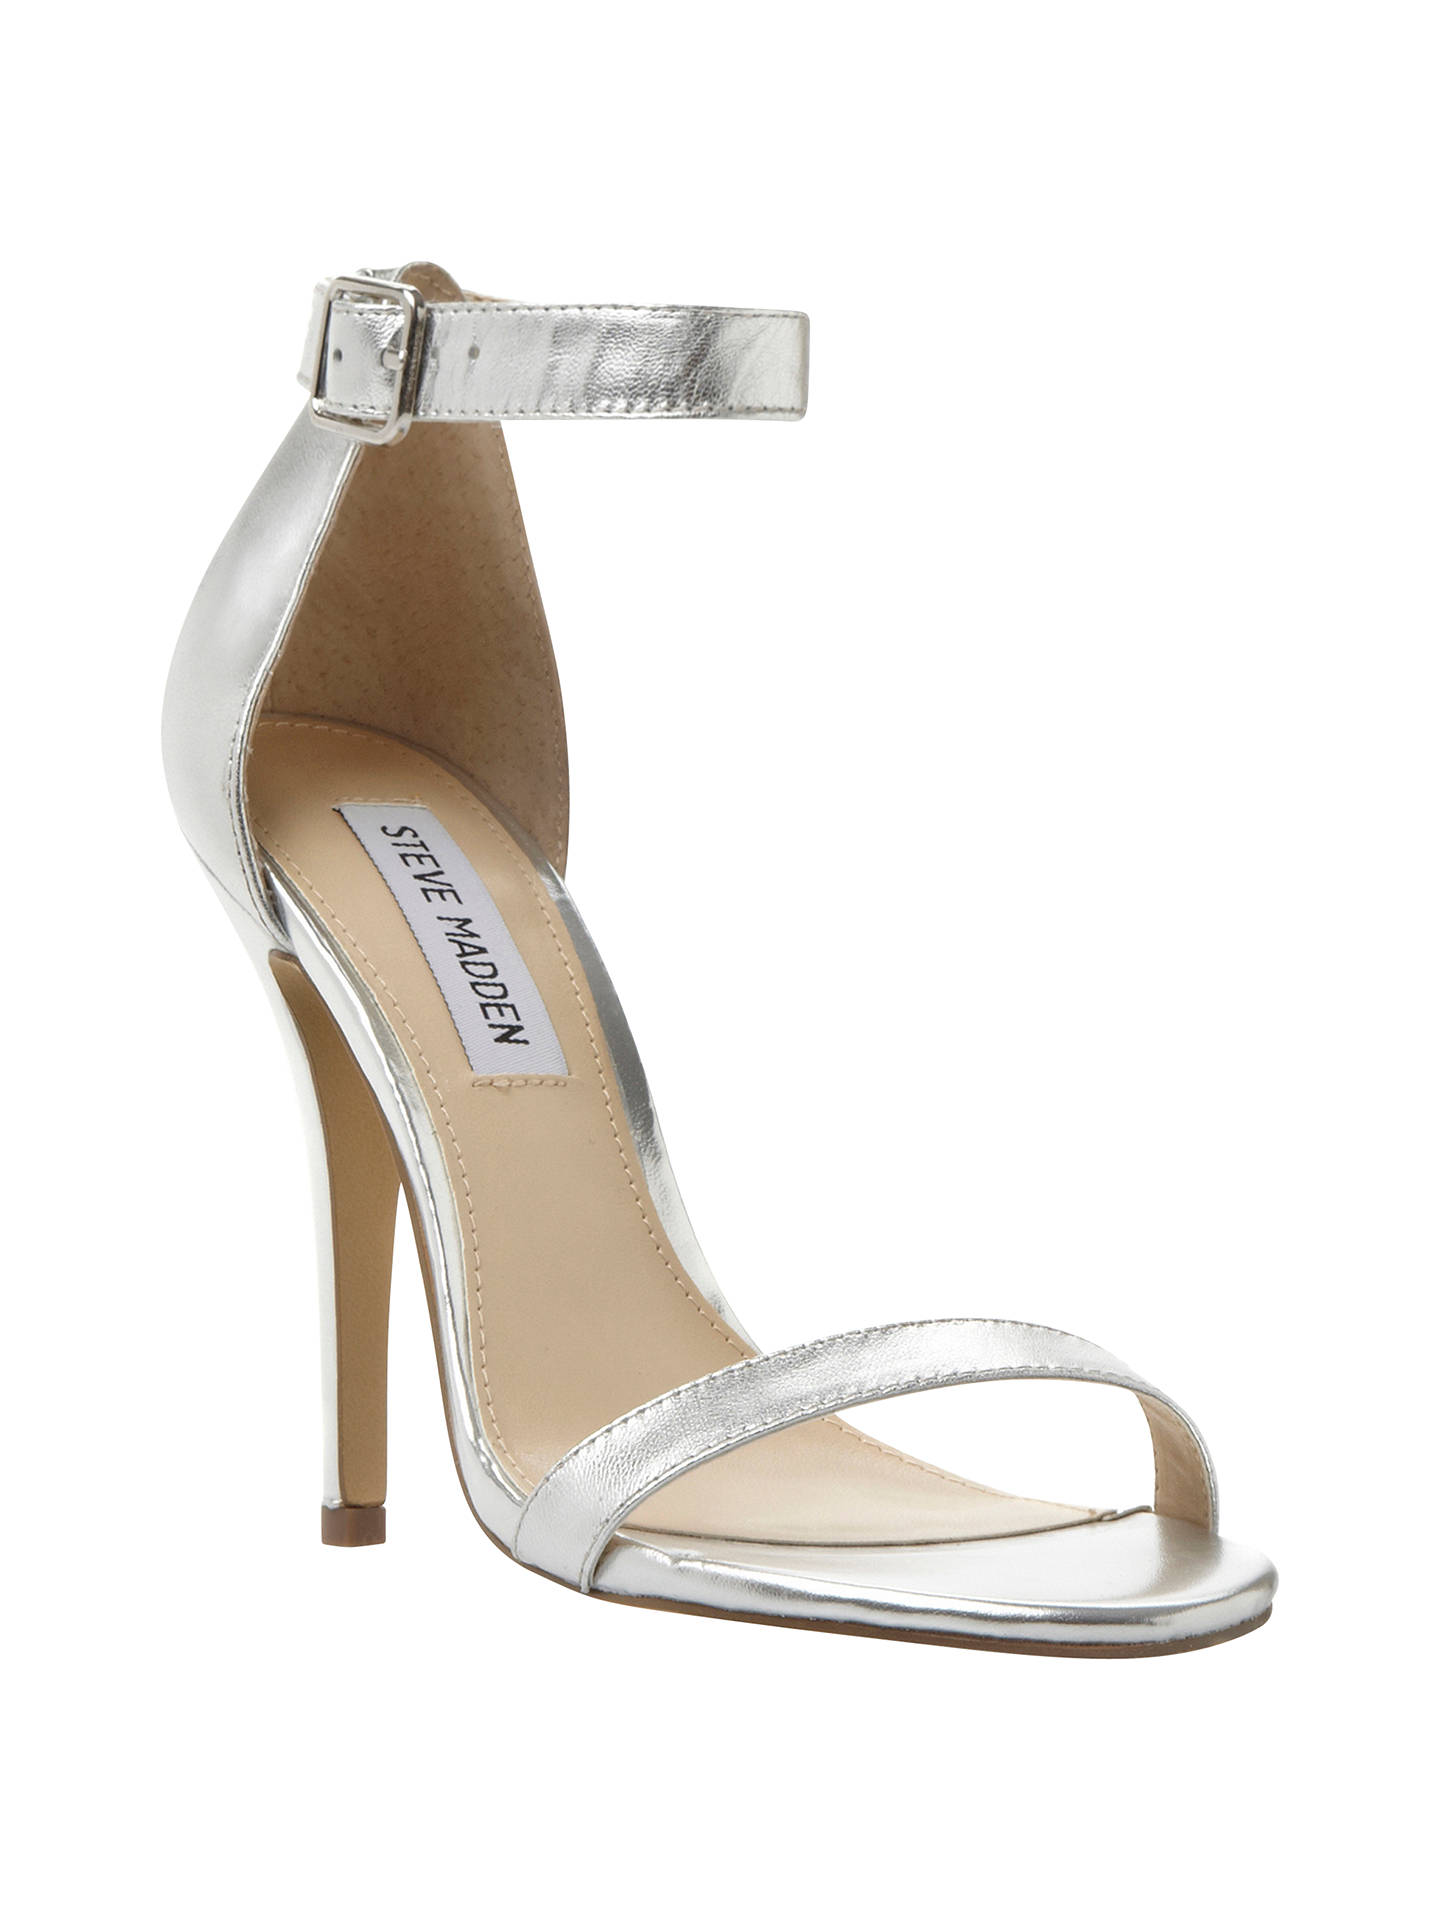 c3c90b215c6 Steve Madden Realove Sandals at John Lewis   Partners